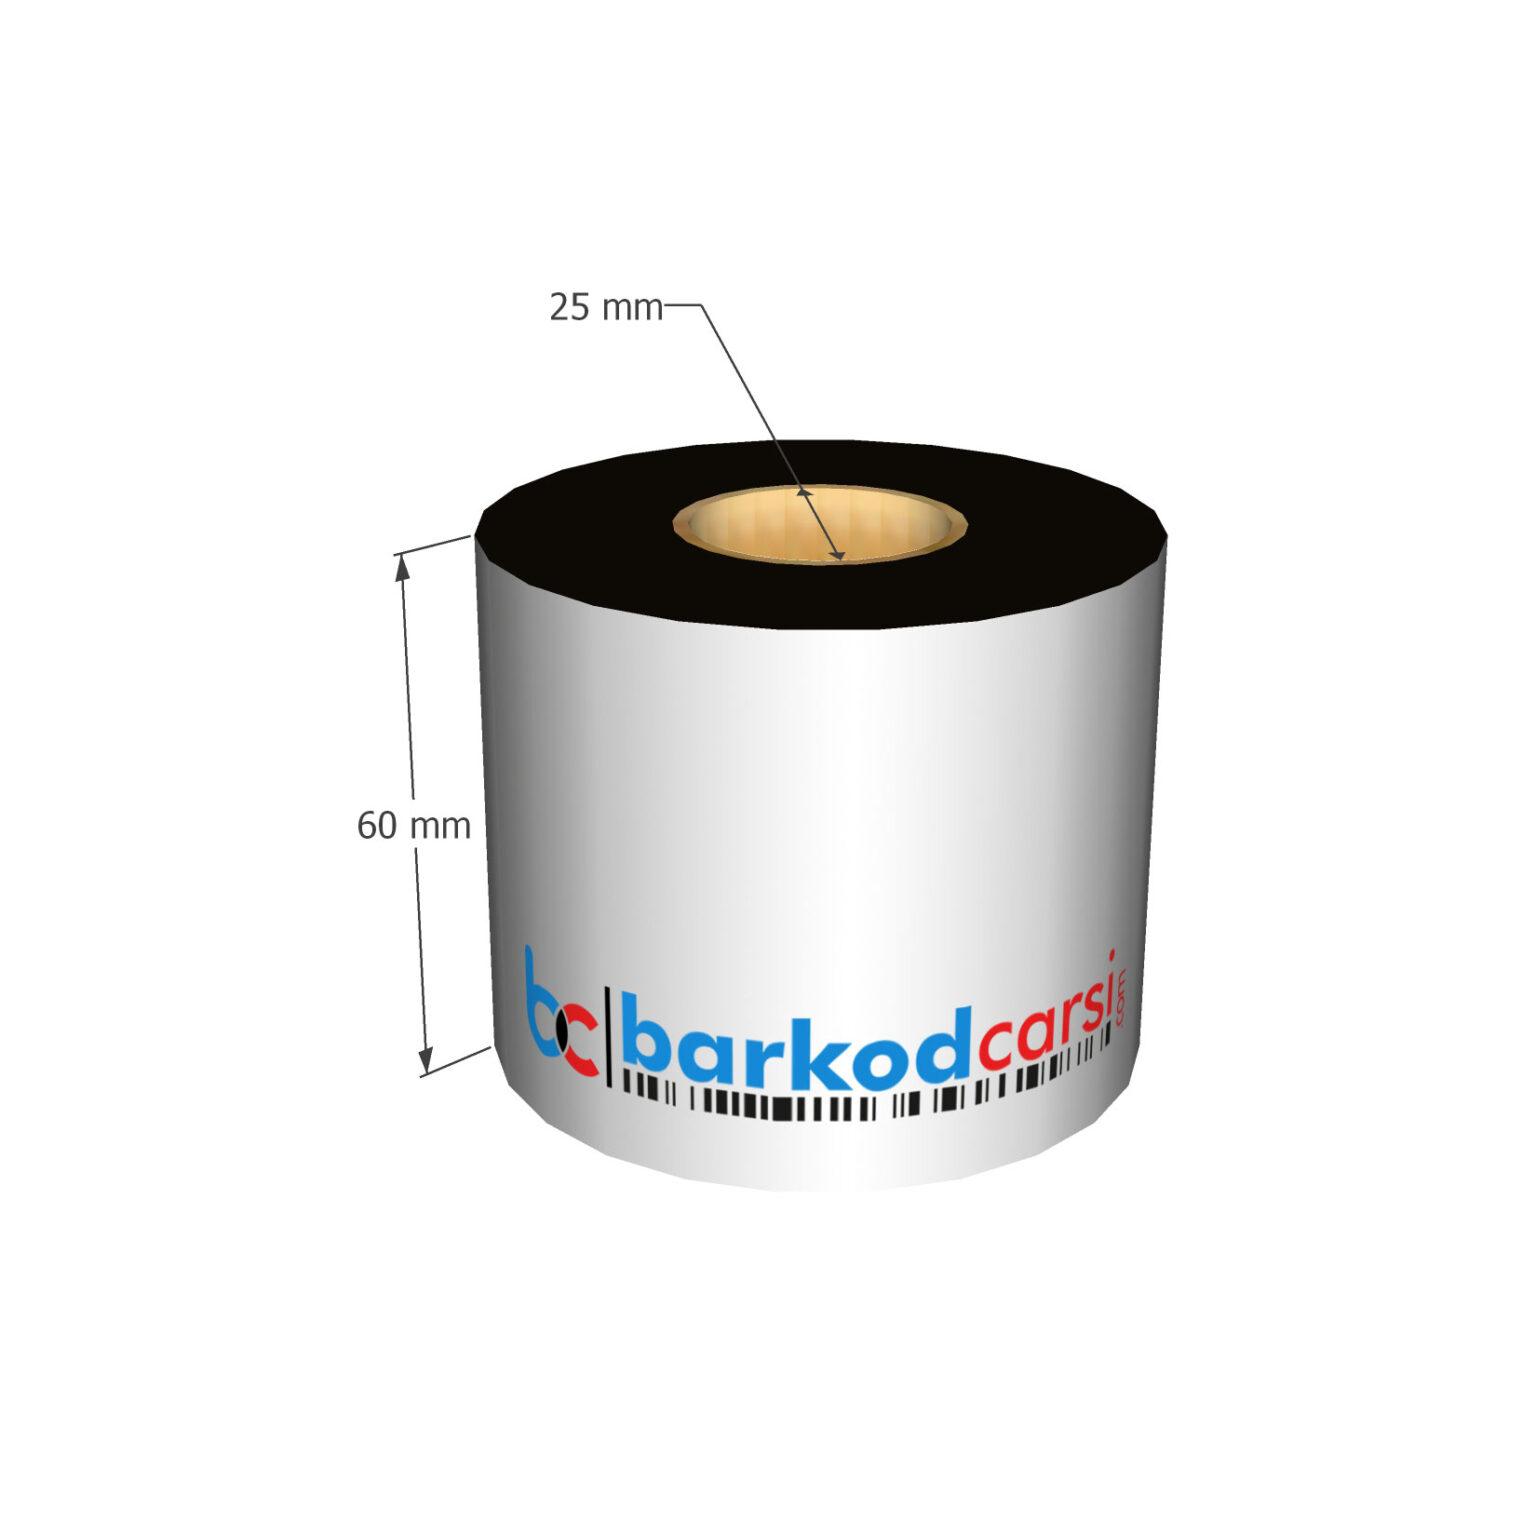 60x300 mt Wax / Wax-Resin / Resin / Hot-Foil Ribon Çeşitleri By BarkodCarsi.com